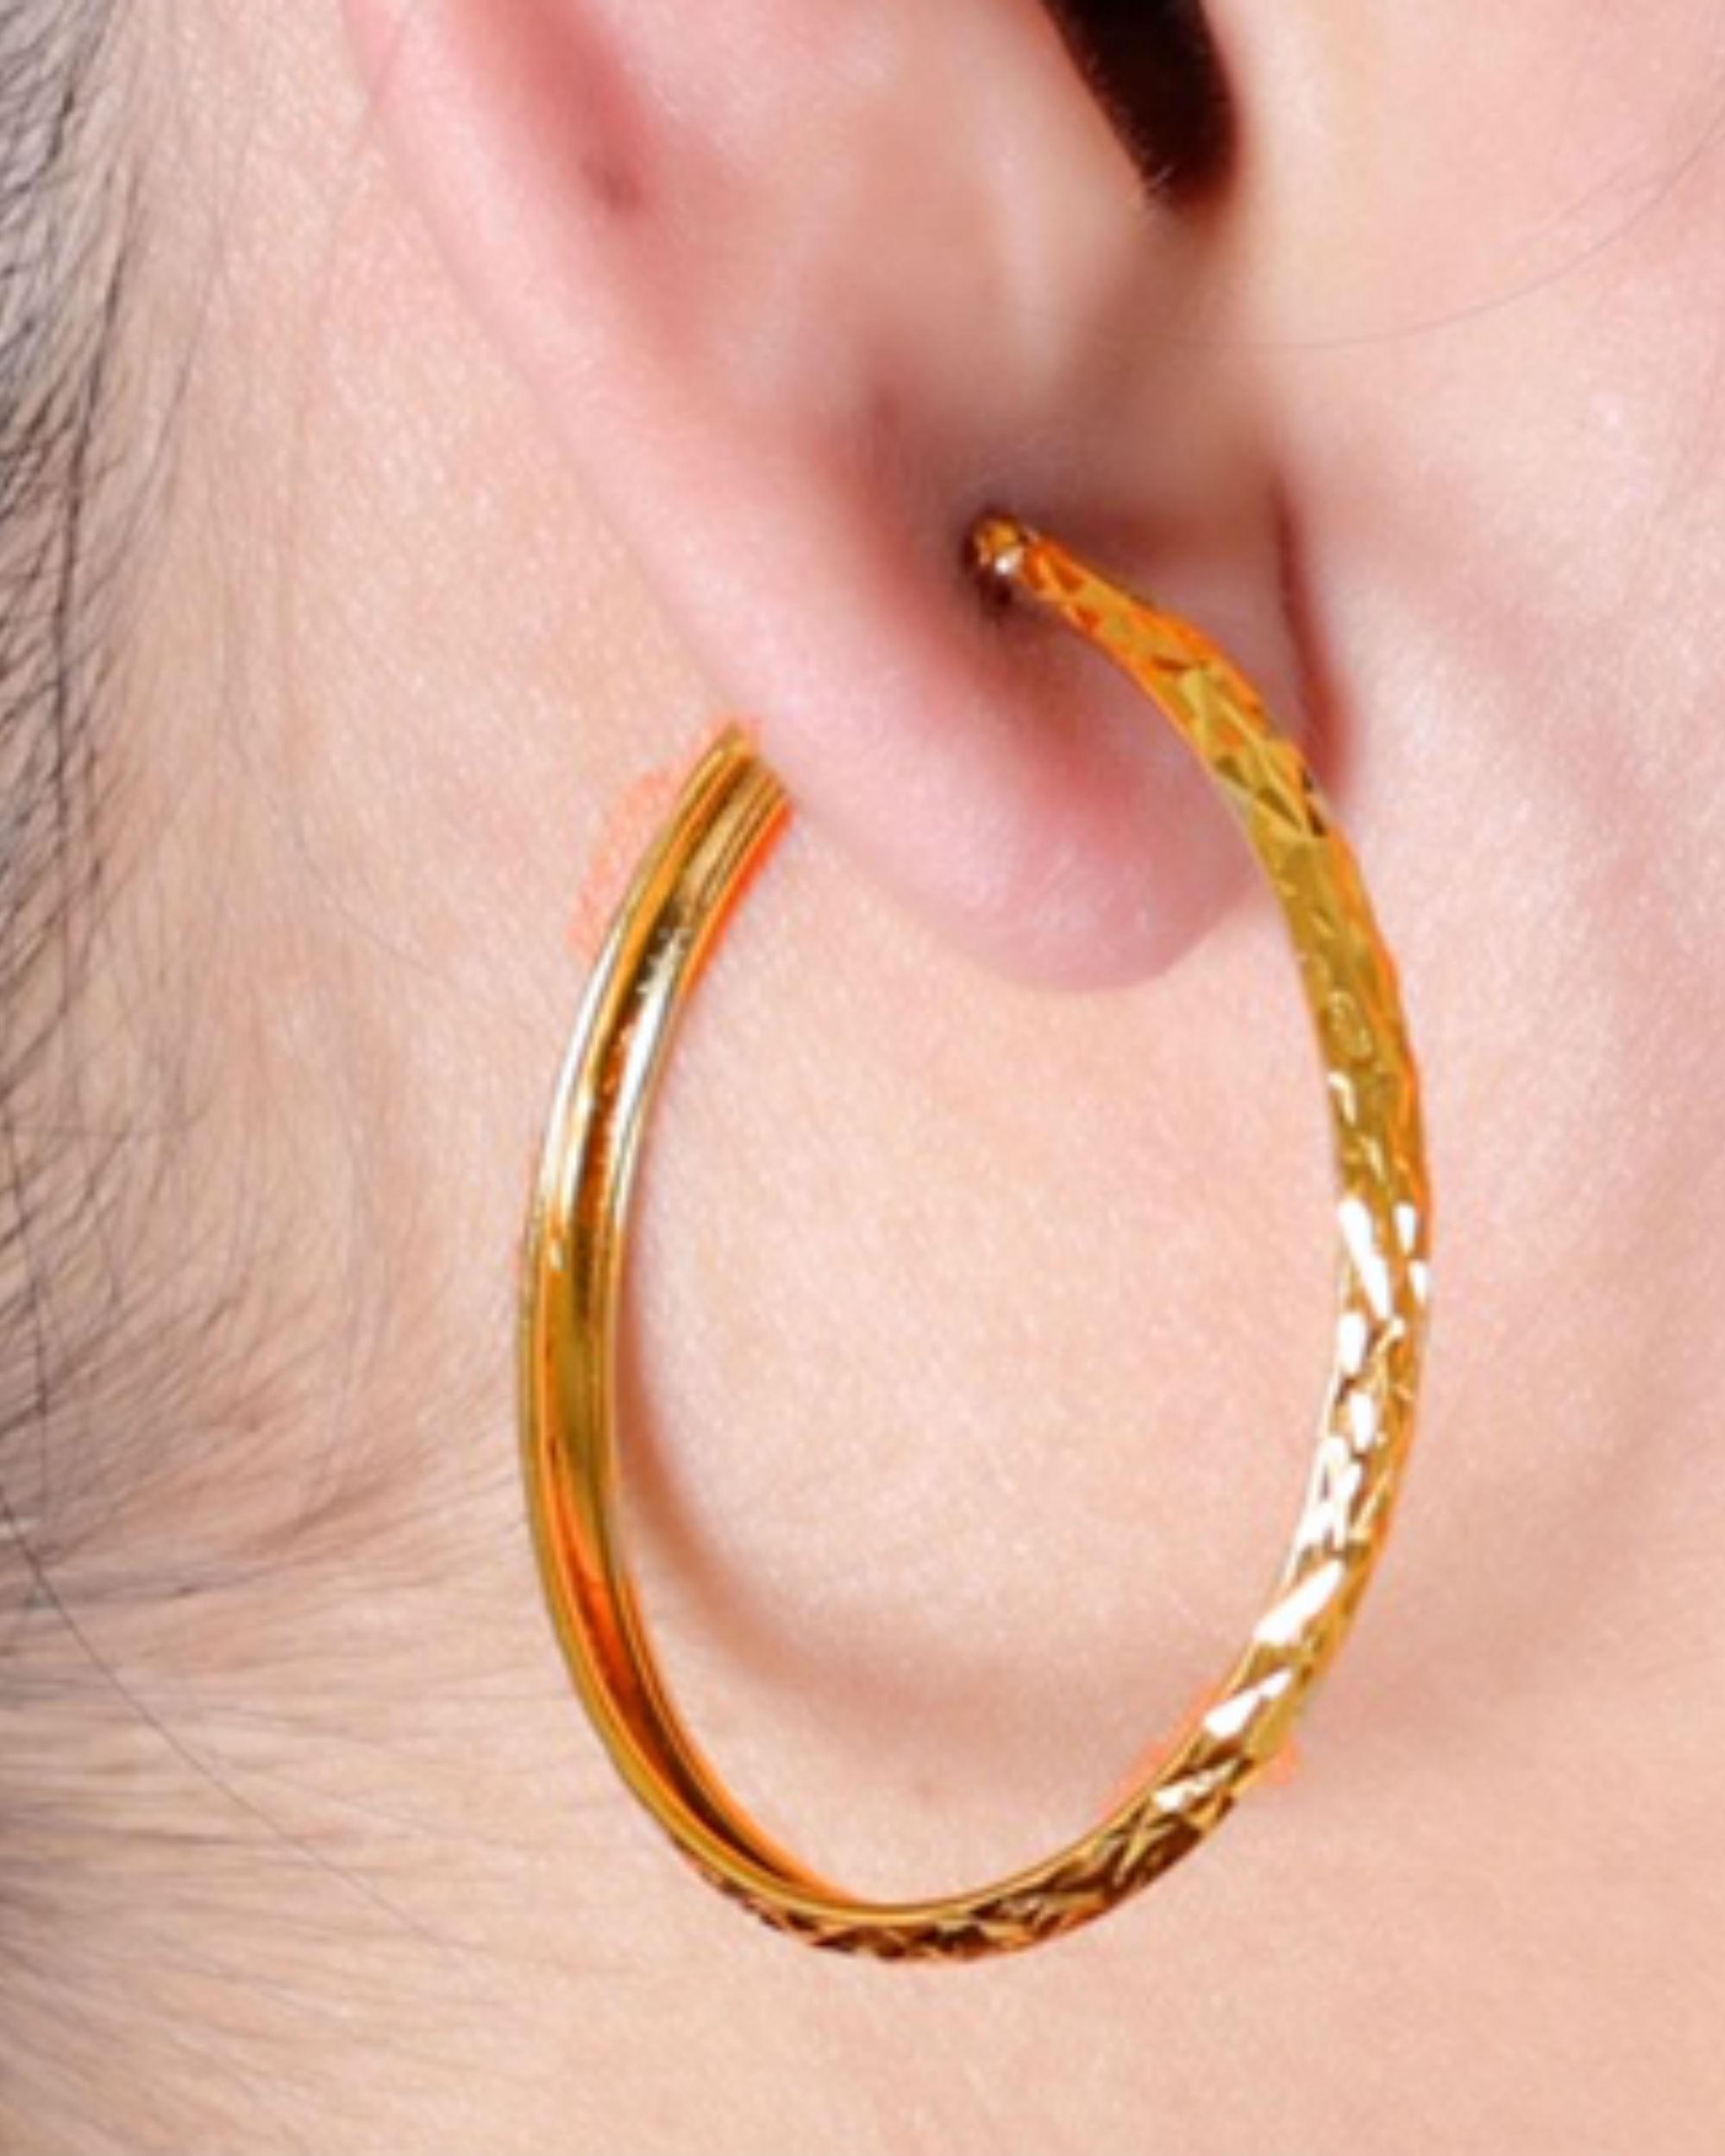 Golden circle earrings